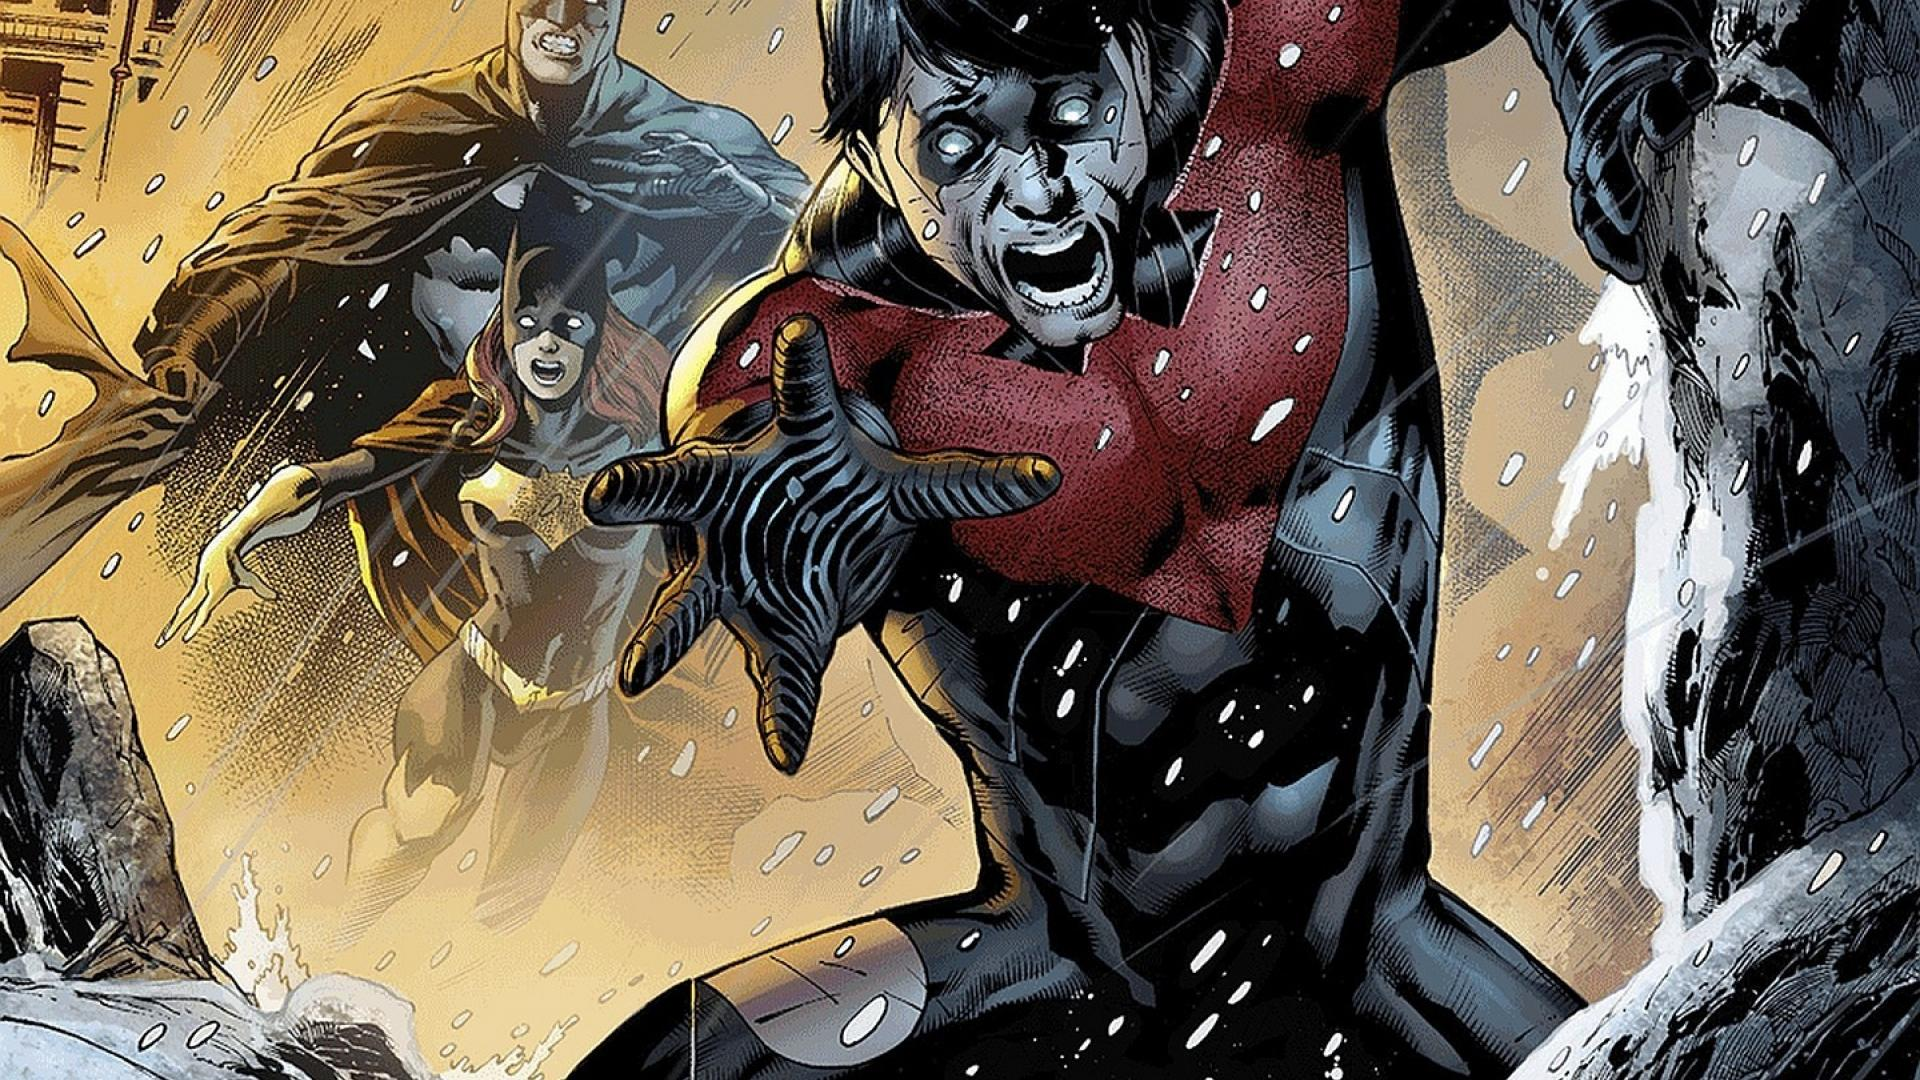 Batman dc comics batgirl nightwing wallpaper 43945 1920x1080